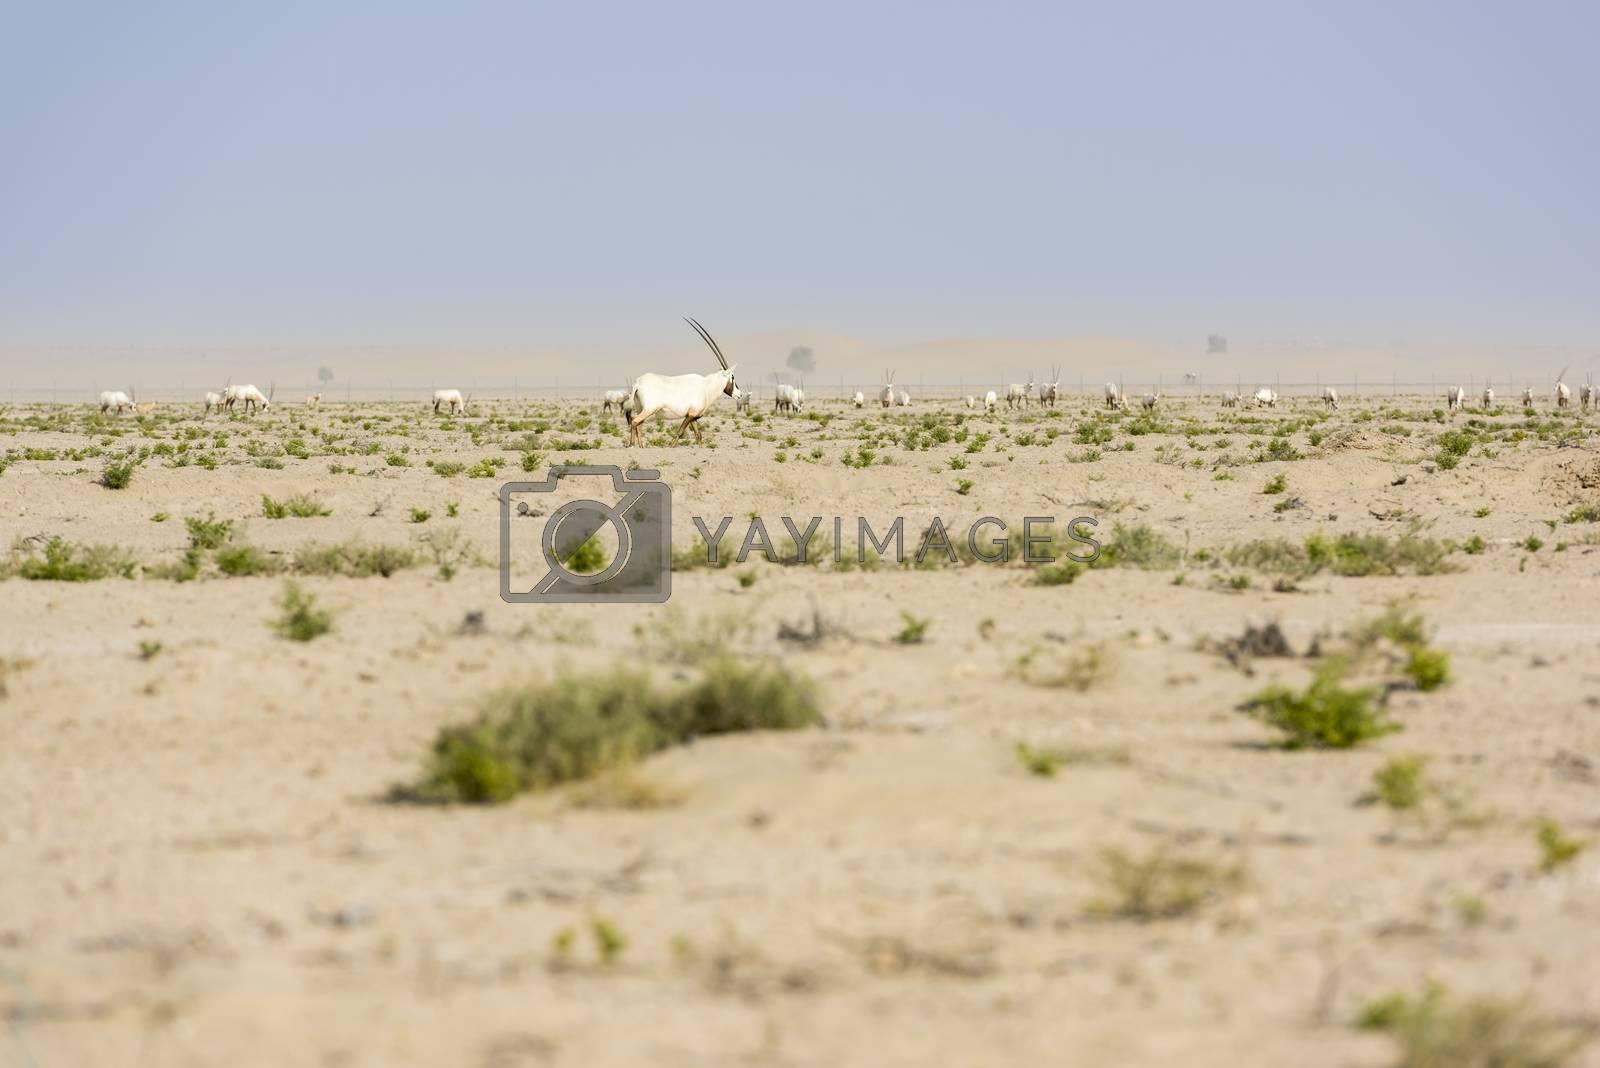 Herd of Arabian oryx in Dubai Desert, United Arab Emirates by GABIS